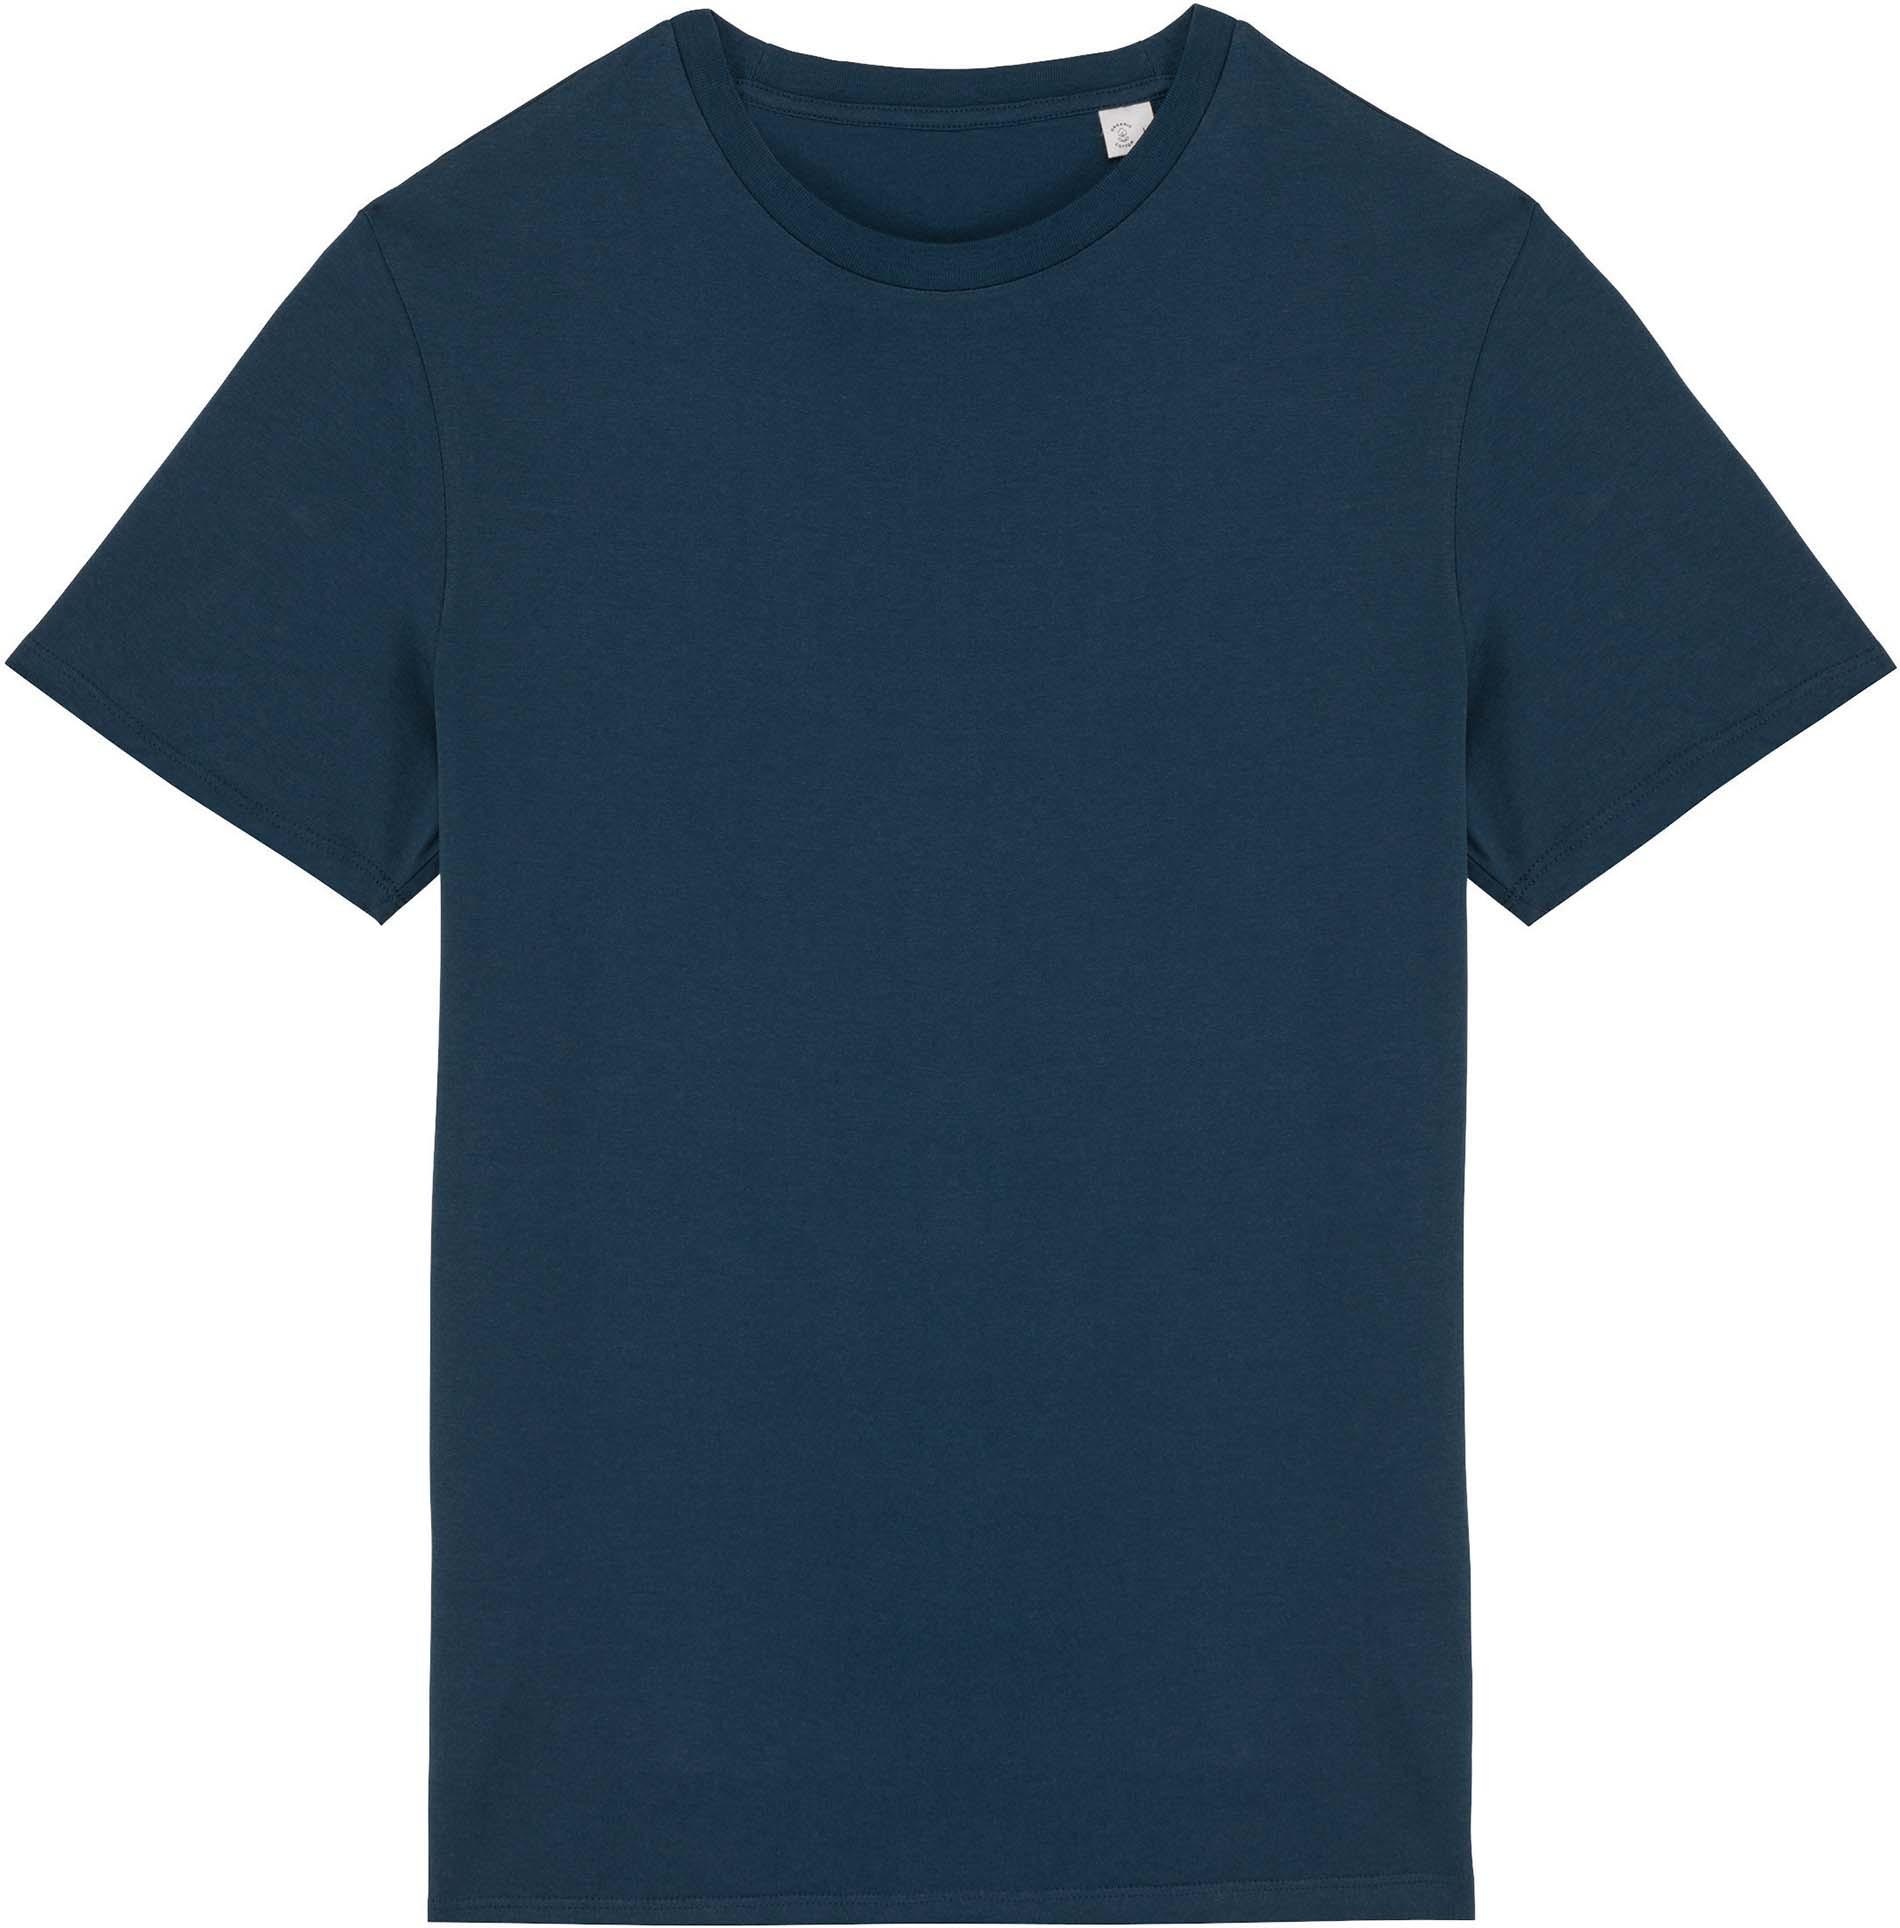 Tee-shirt manches courtes unisexe - 2-1843-15